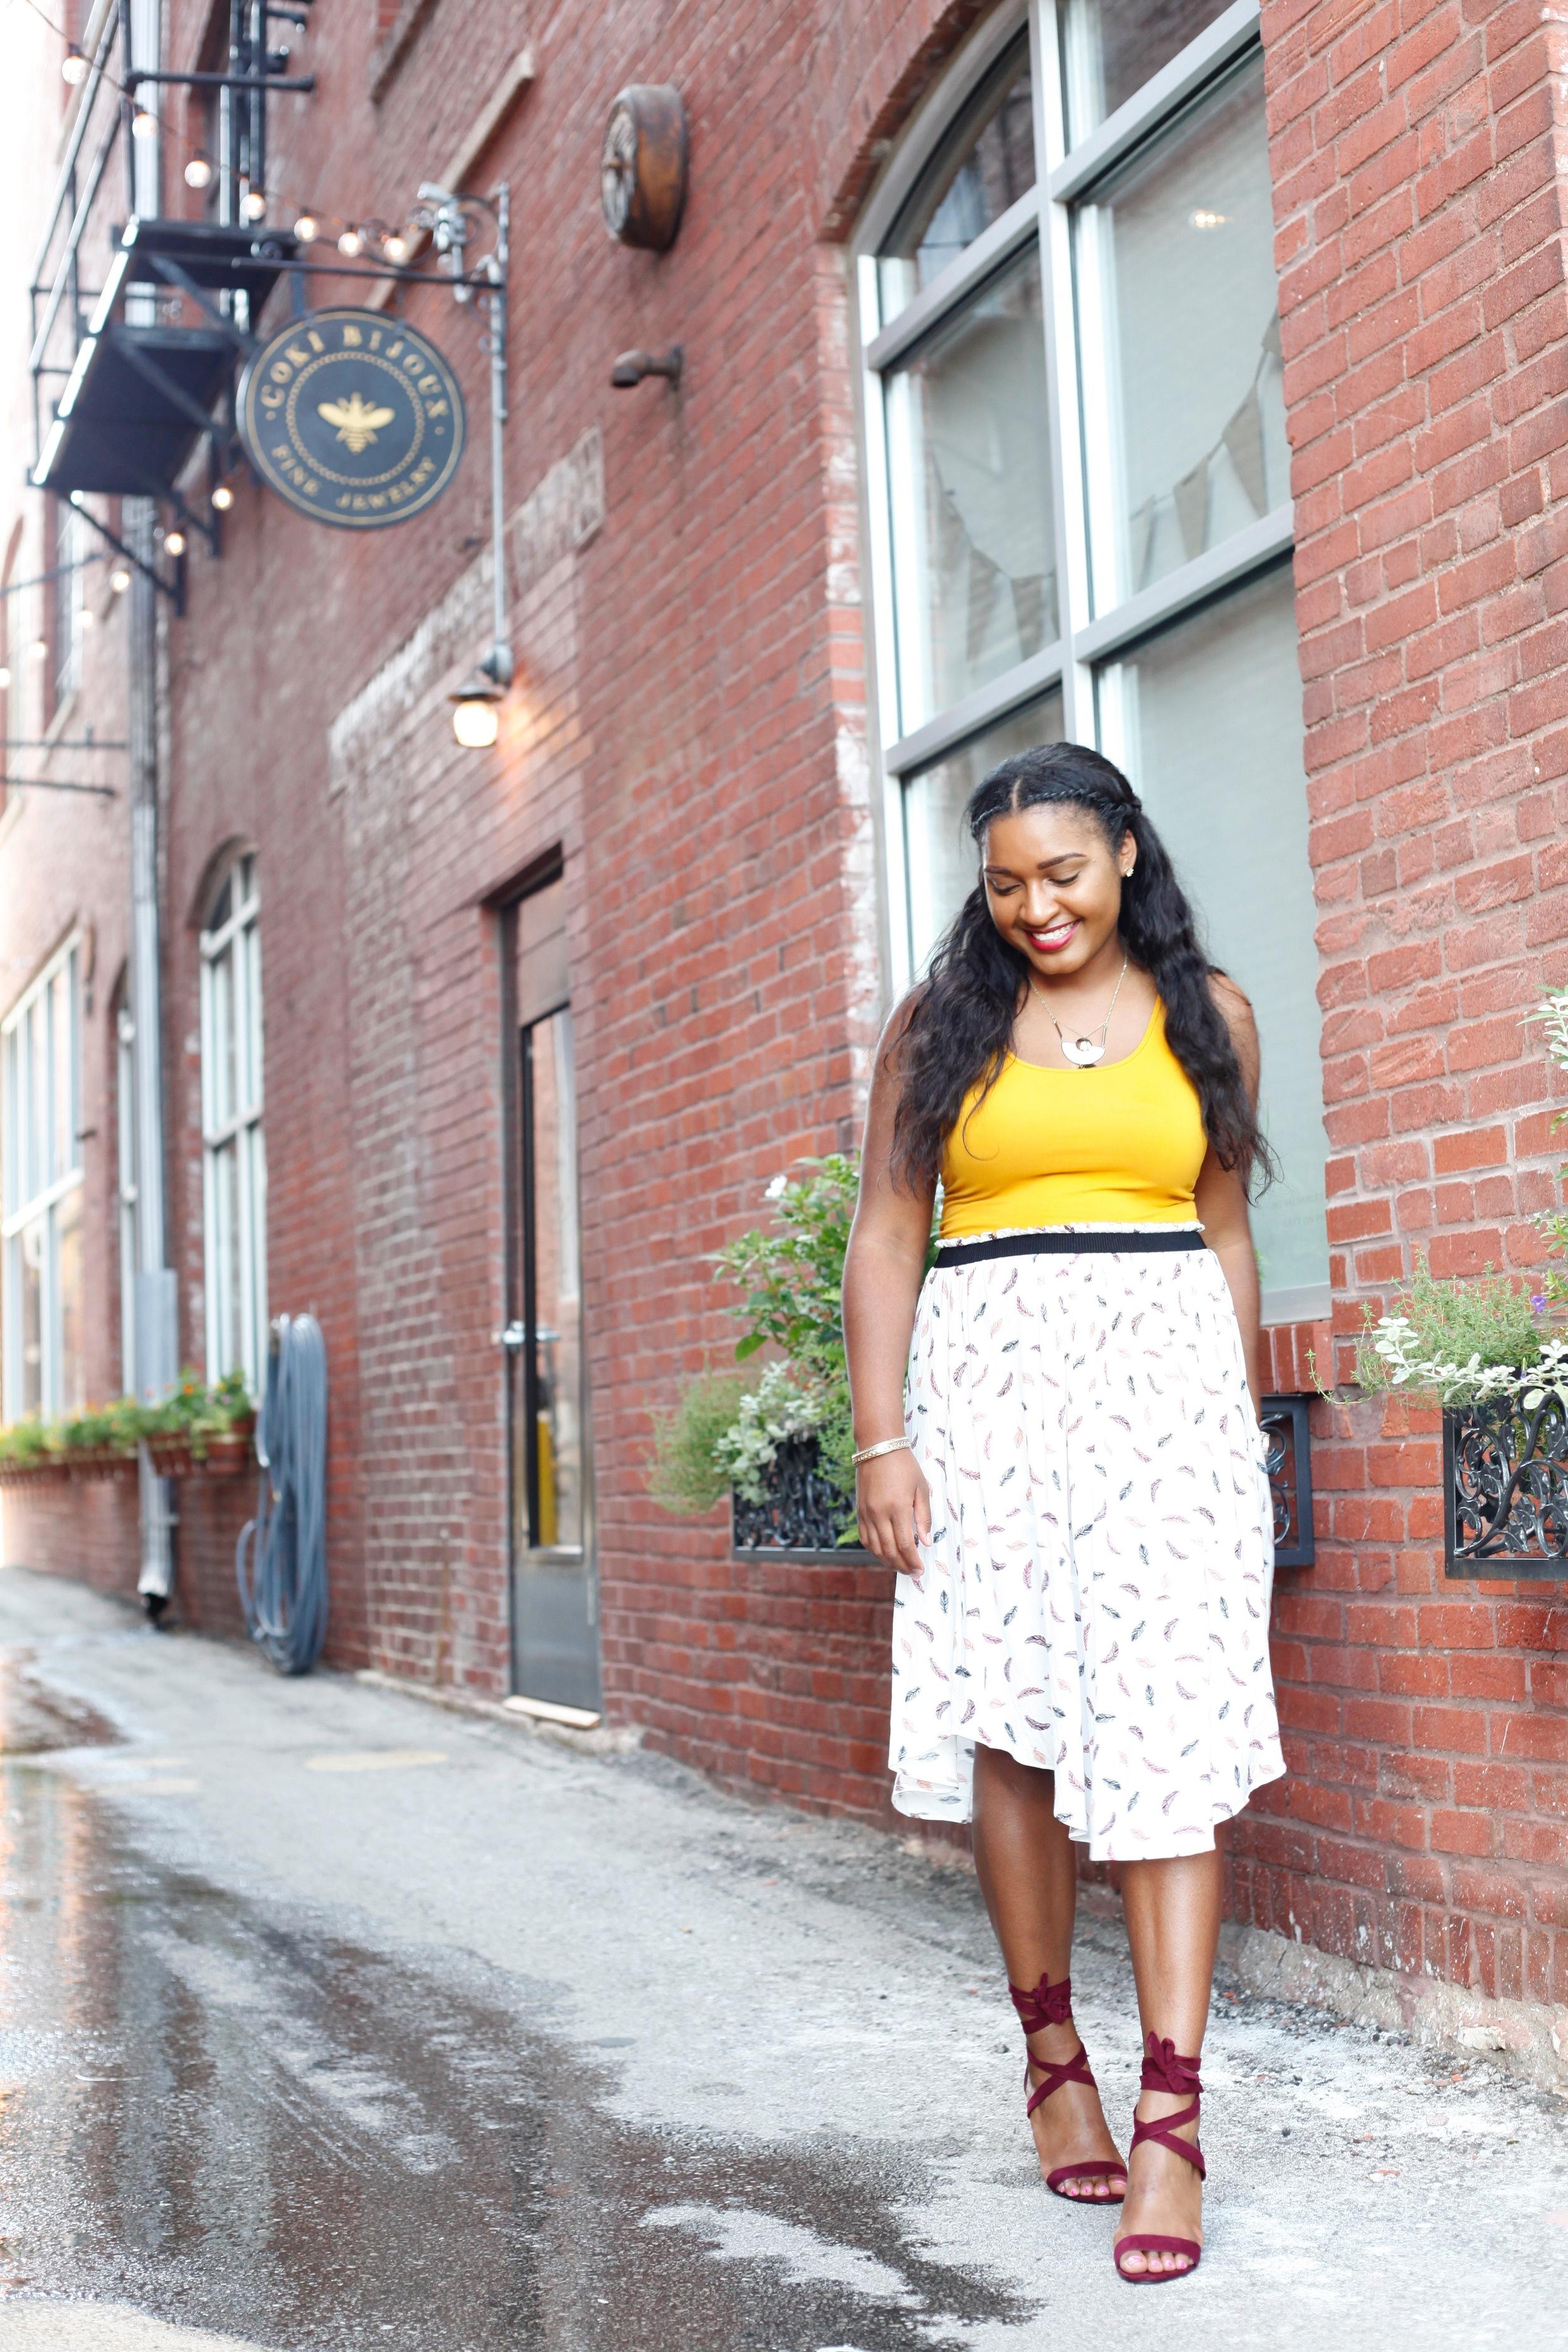 Kansas City blogger. Printed Skirt + Sexy Wrap Wedge Sandals by jasmine cooper of jasminediane.com